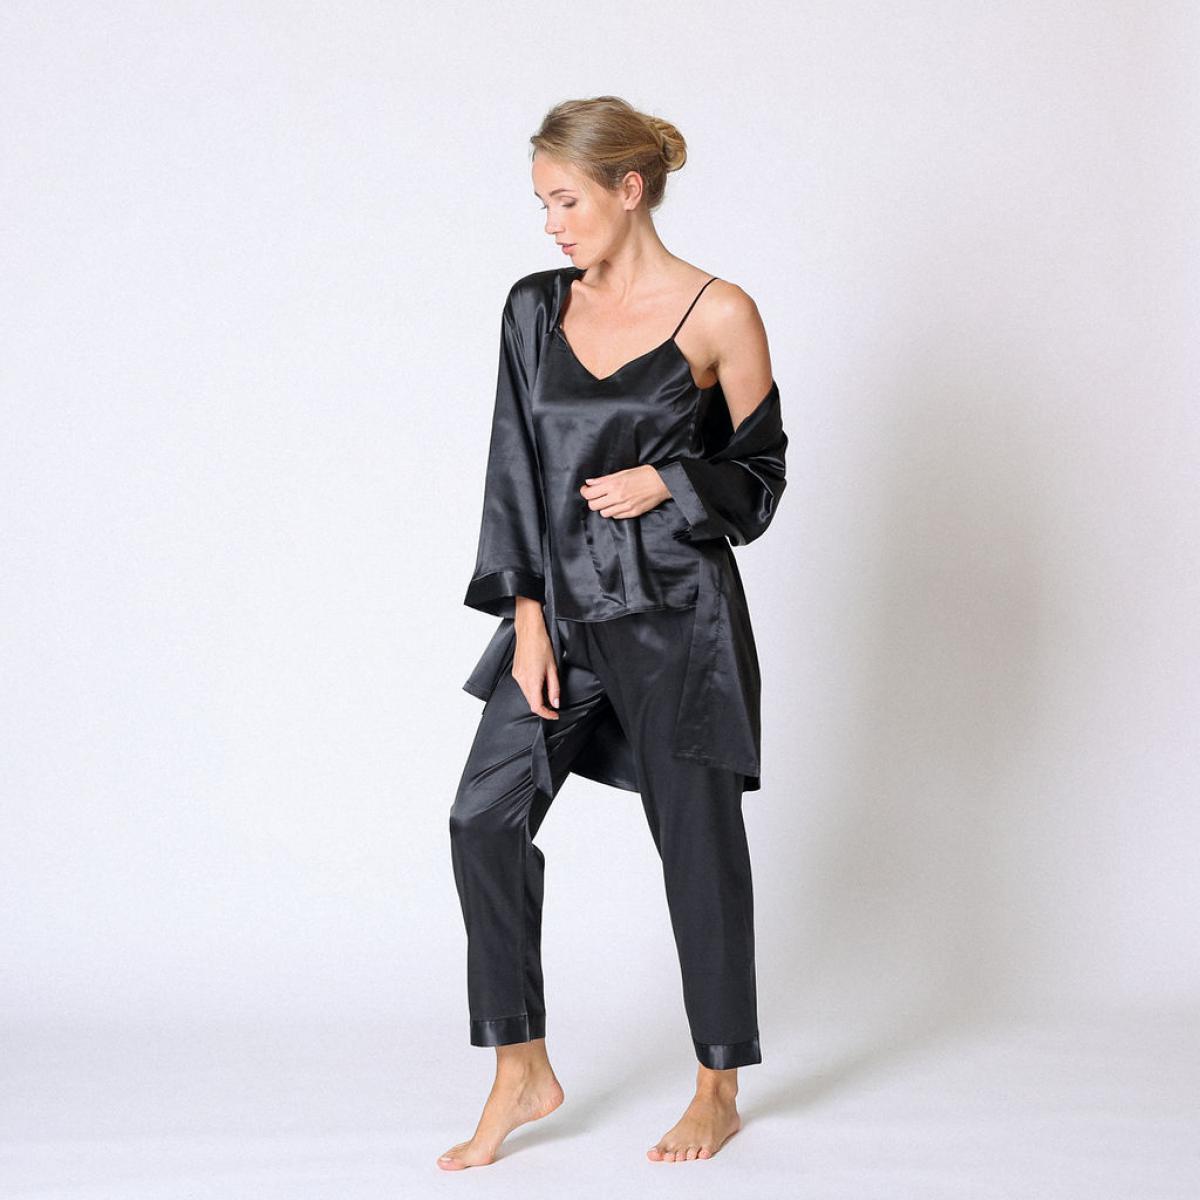 Promo : Ensemble pyjama satin et déshabillié Noir - Midnight Lingerie - Modalova